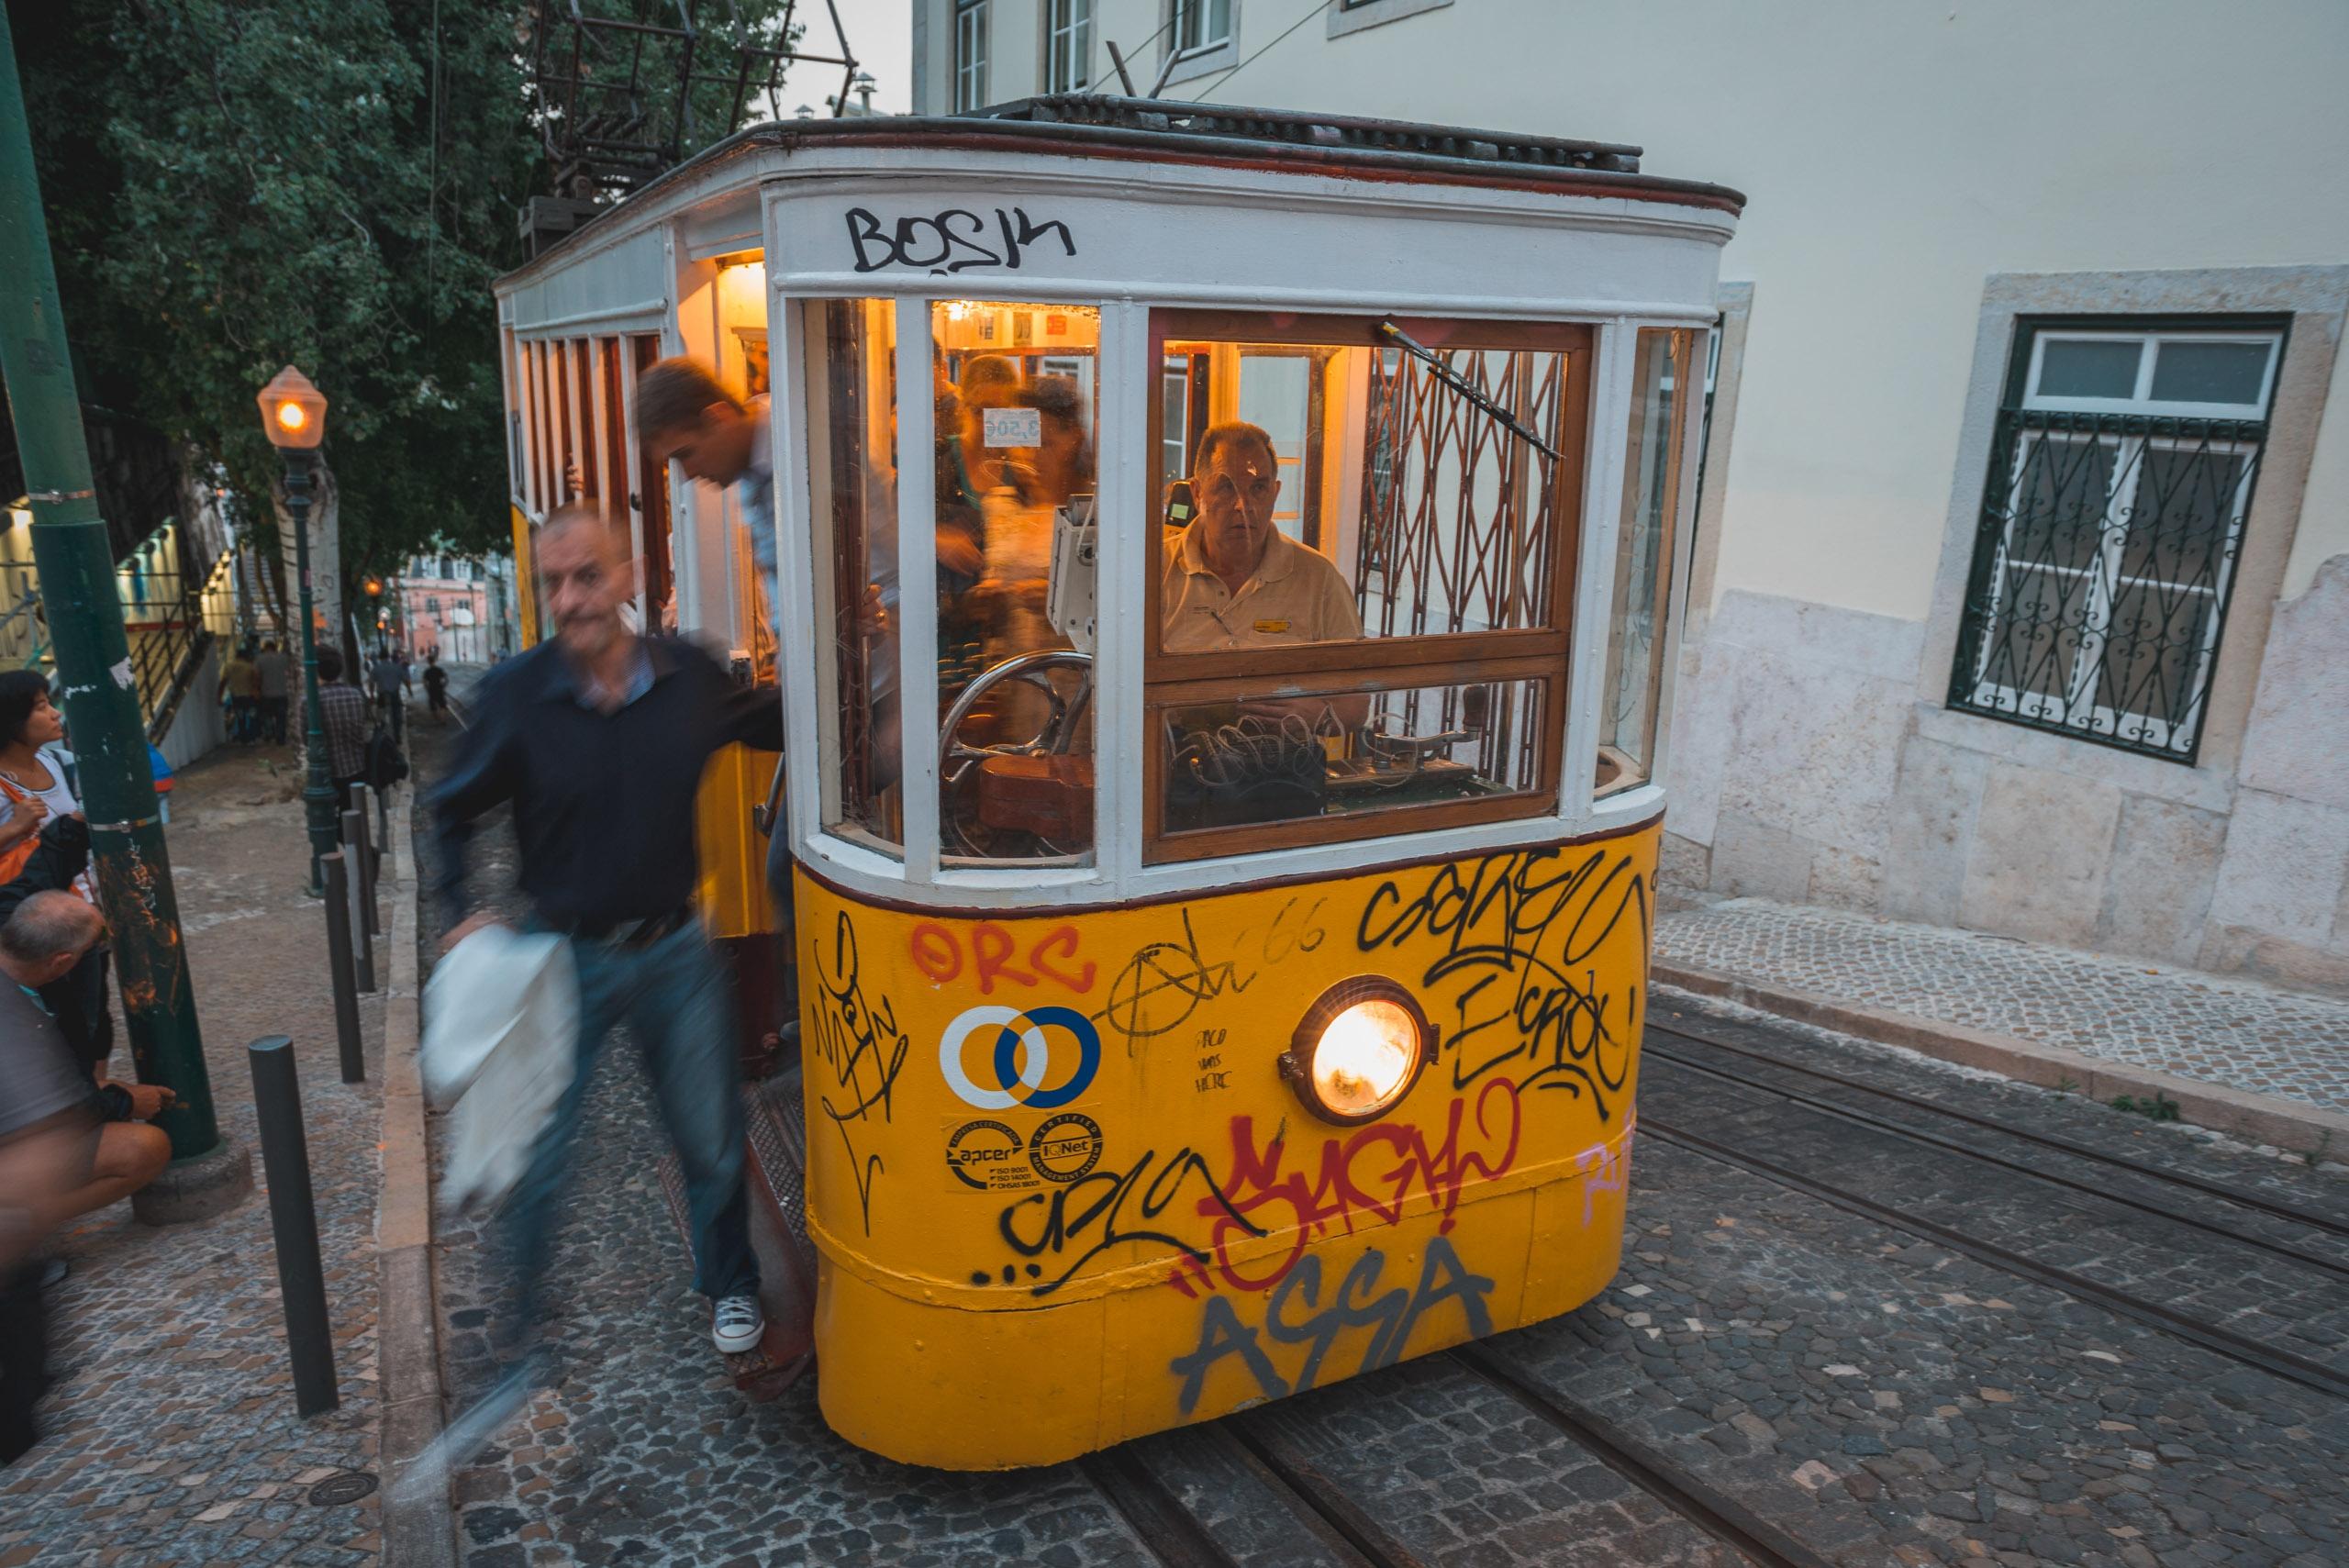 Portugal - Lisbon - 2012-0923-DSC_1647_31054